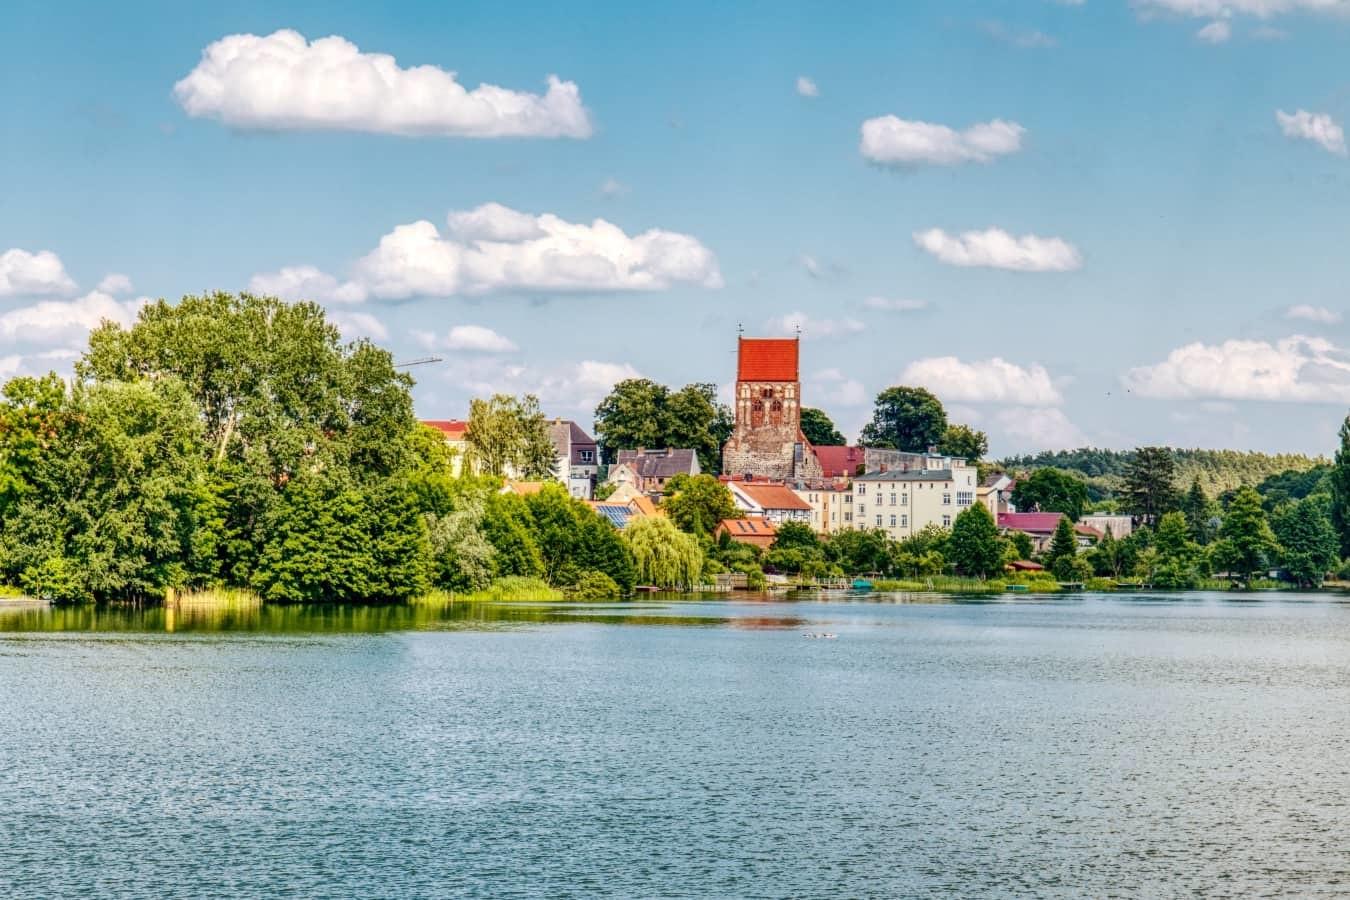 stadt-lychen-uckermark-brandenburg-panorama